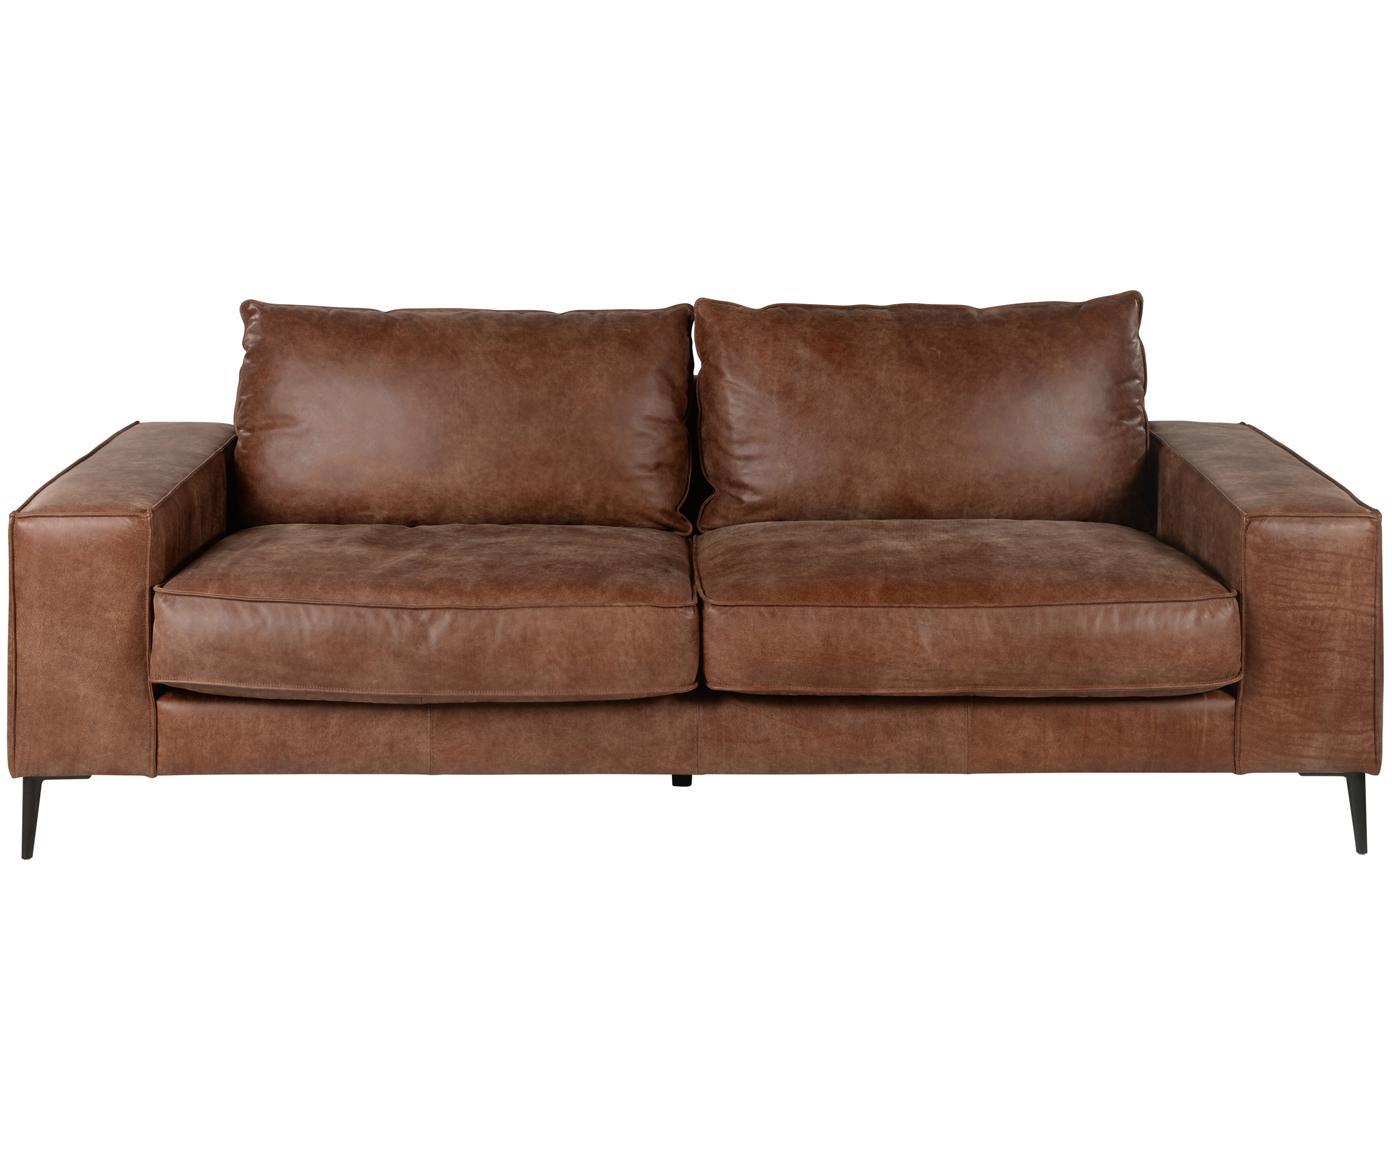 Leder-Sofa Brett (3-Sitzer), Bezug: Rindsleder, glatt, Gestell: Aluminium, lackiert, Leder Brauntöne, B 215 x T 90 cm